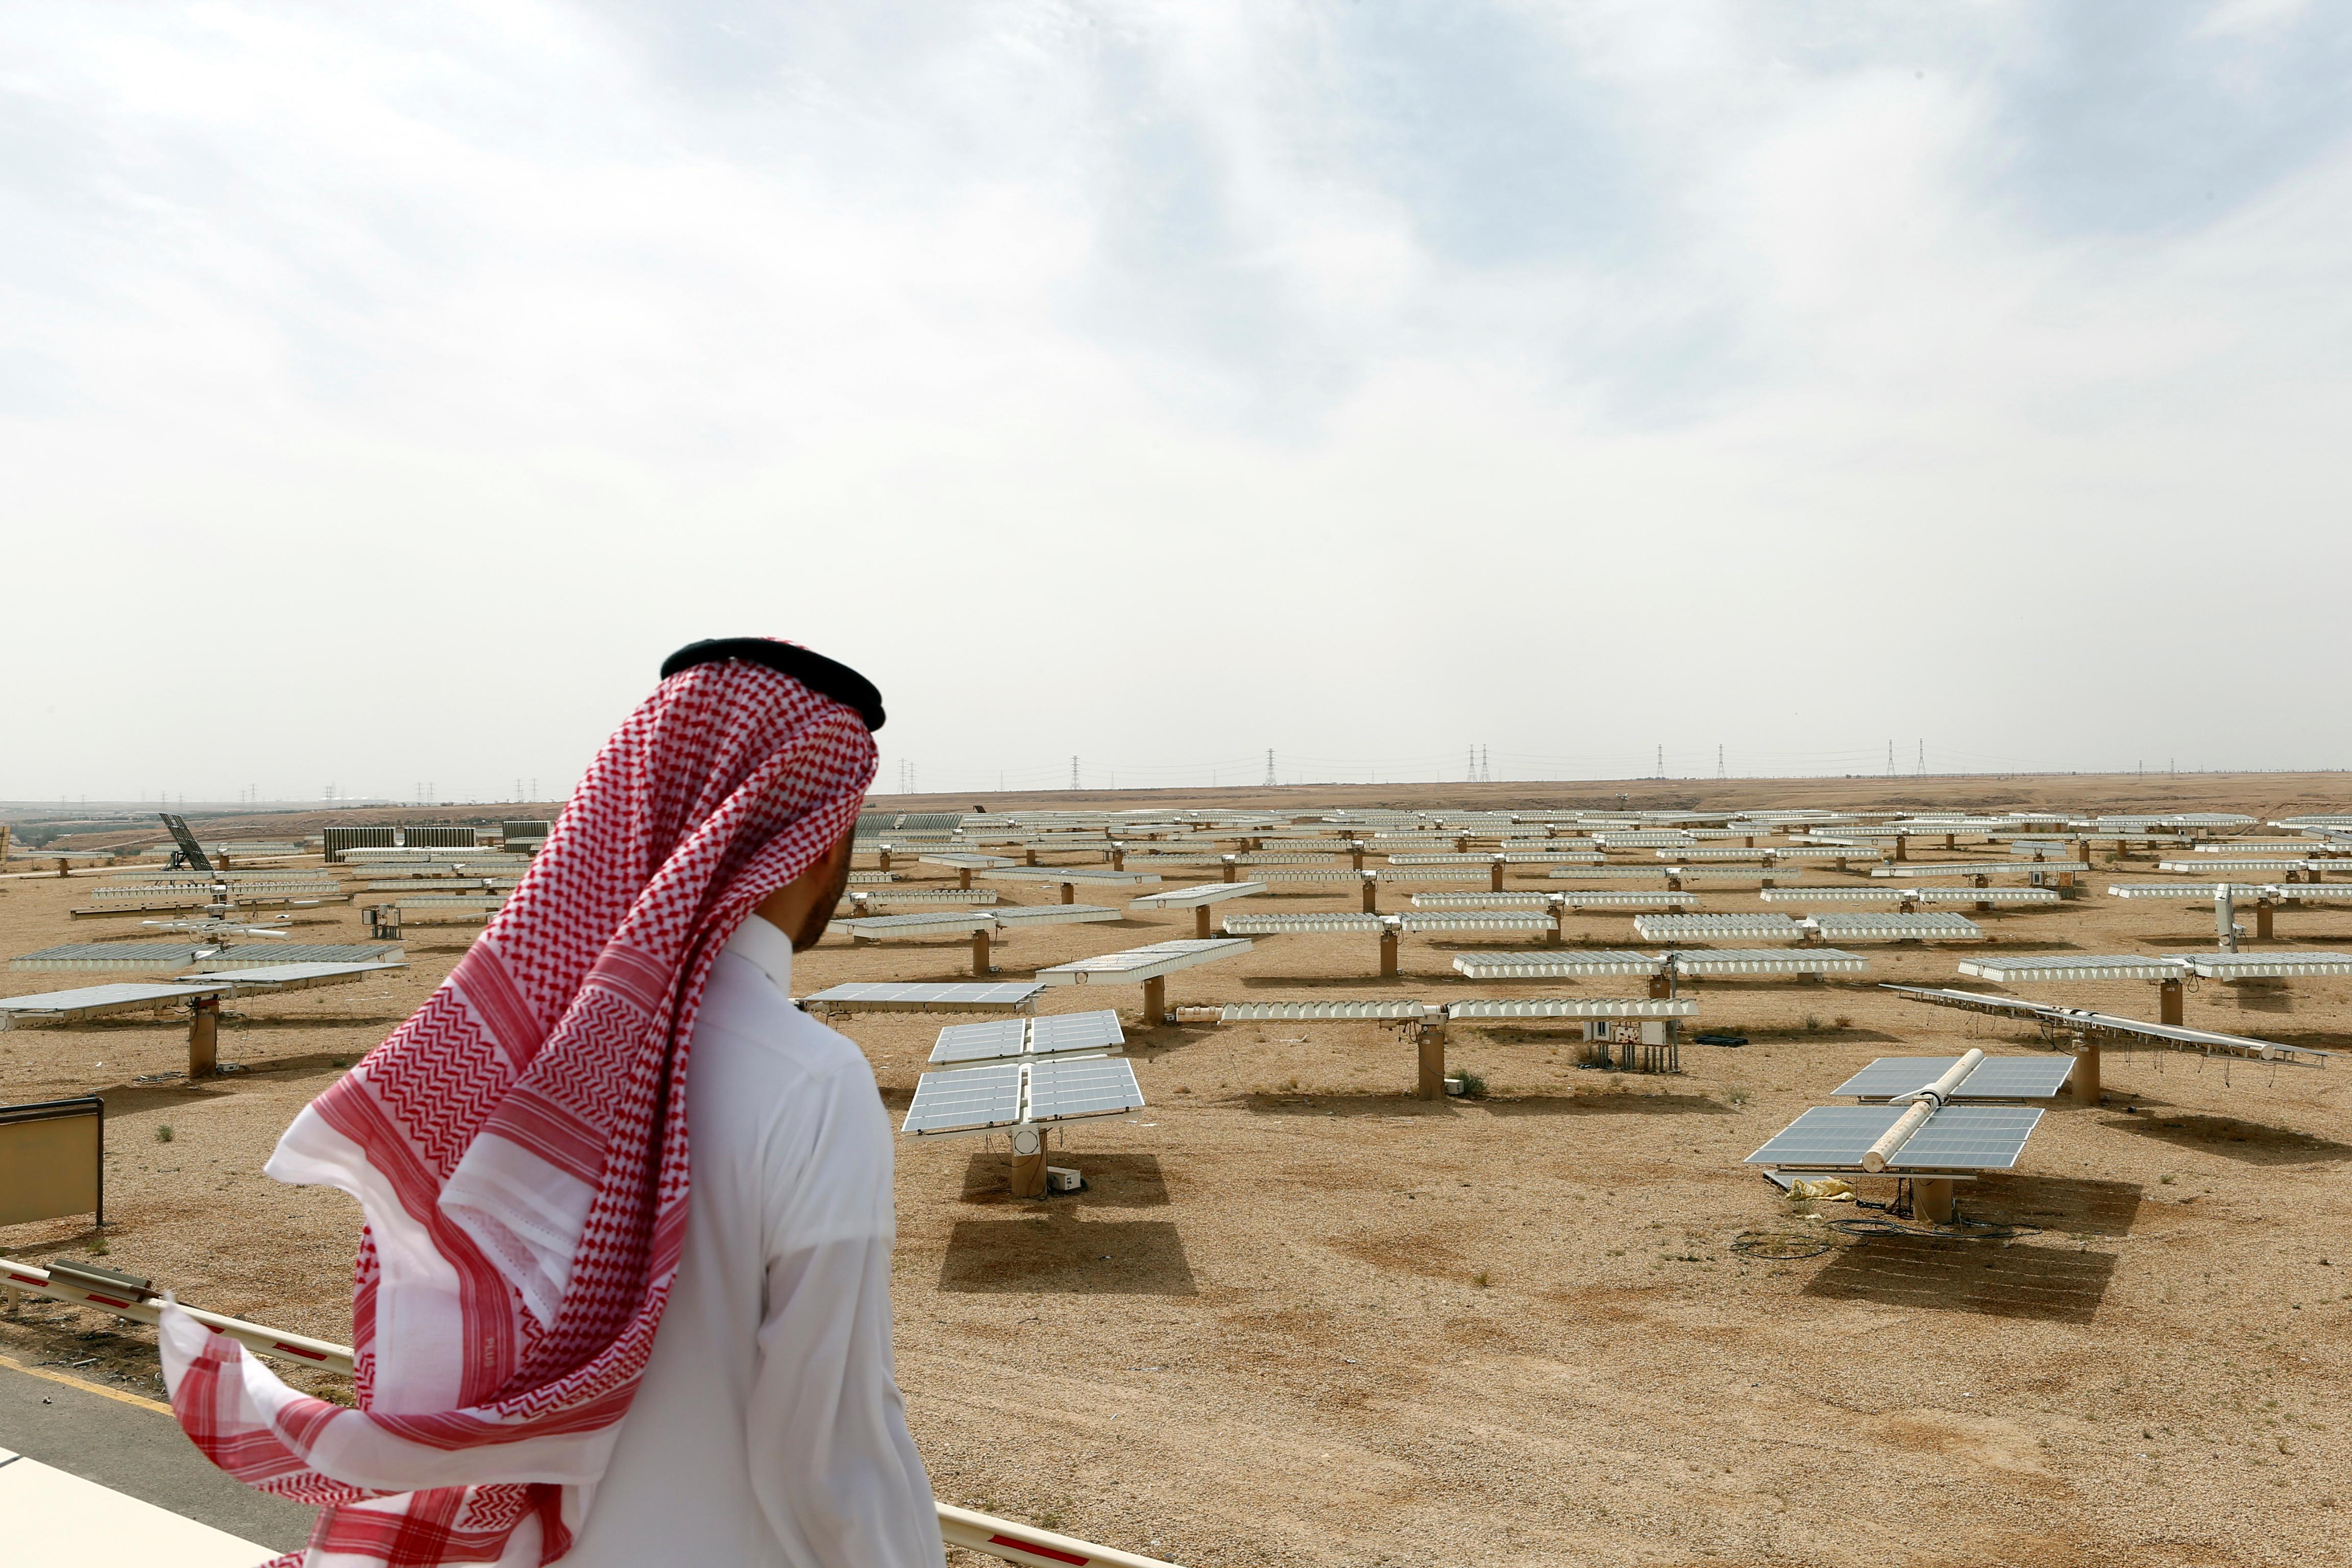 A Saudi man looks at a solar plant in Uyayna, north of Riyadh, Saudi Arabia, April 10, 2018. REUTERS/Faisal Al Nasser